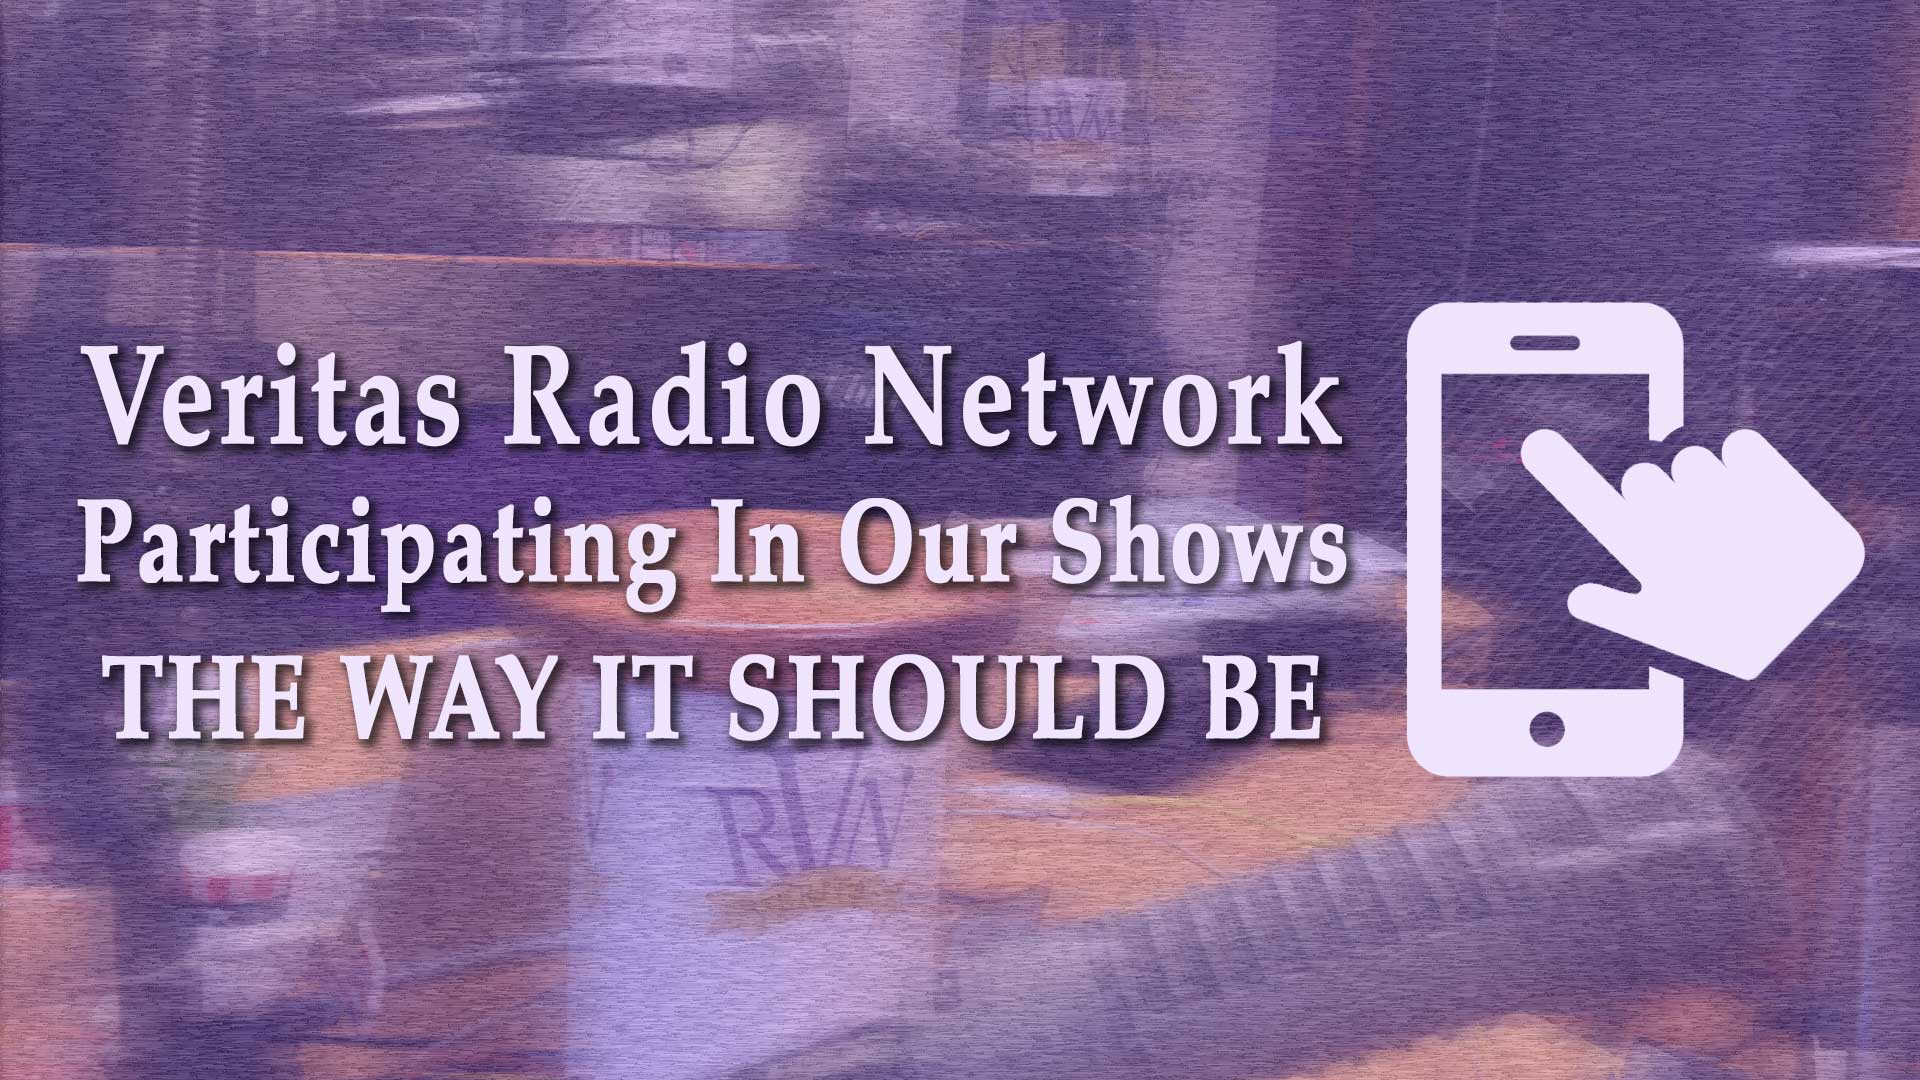 Veritas Announces Mike Church Show Listen Line